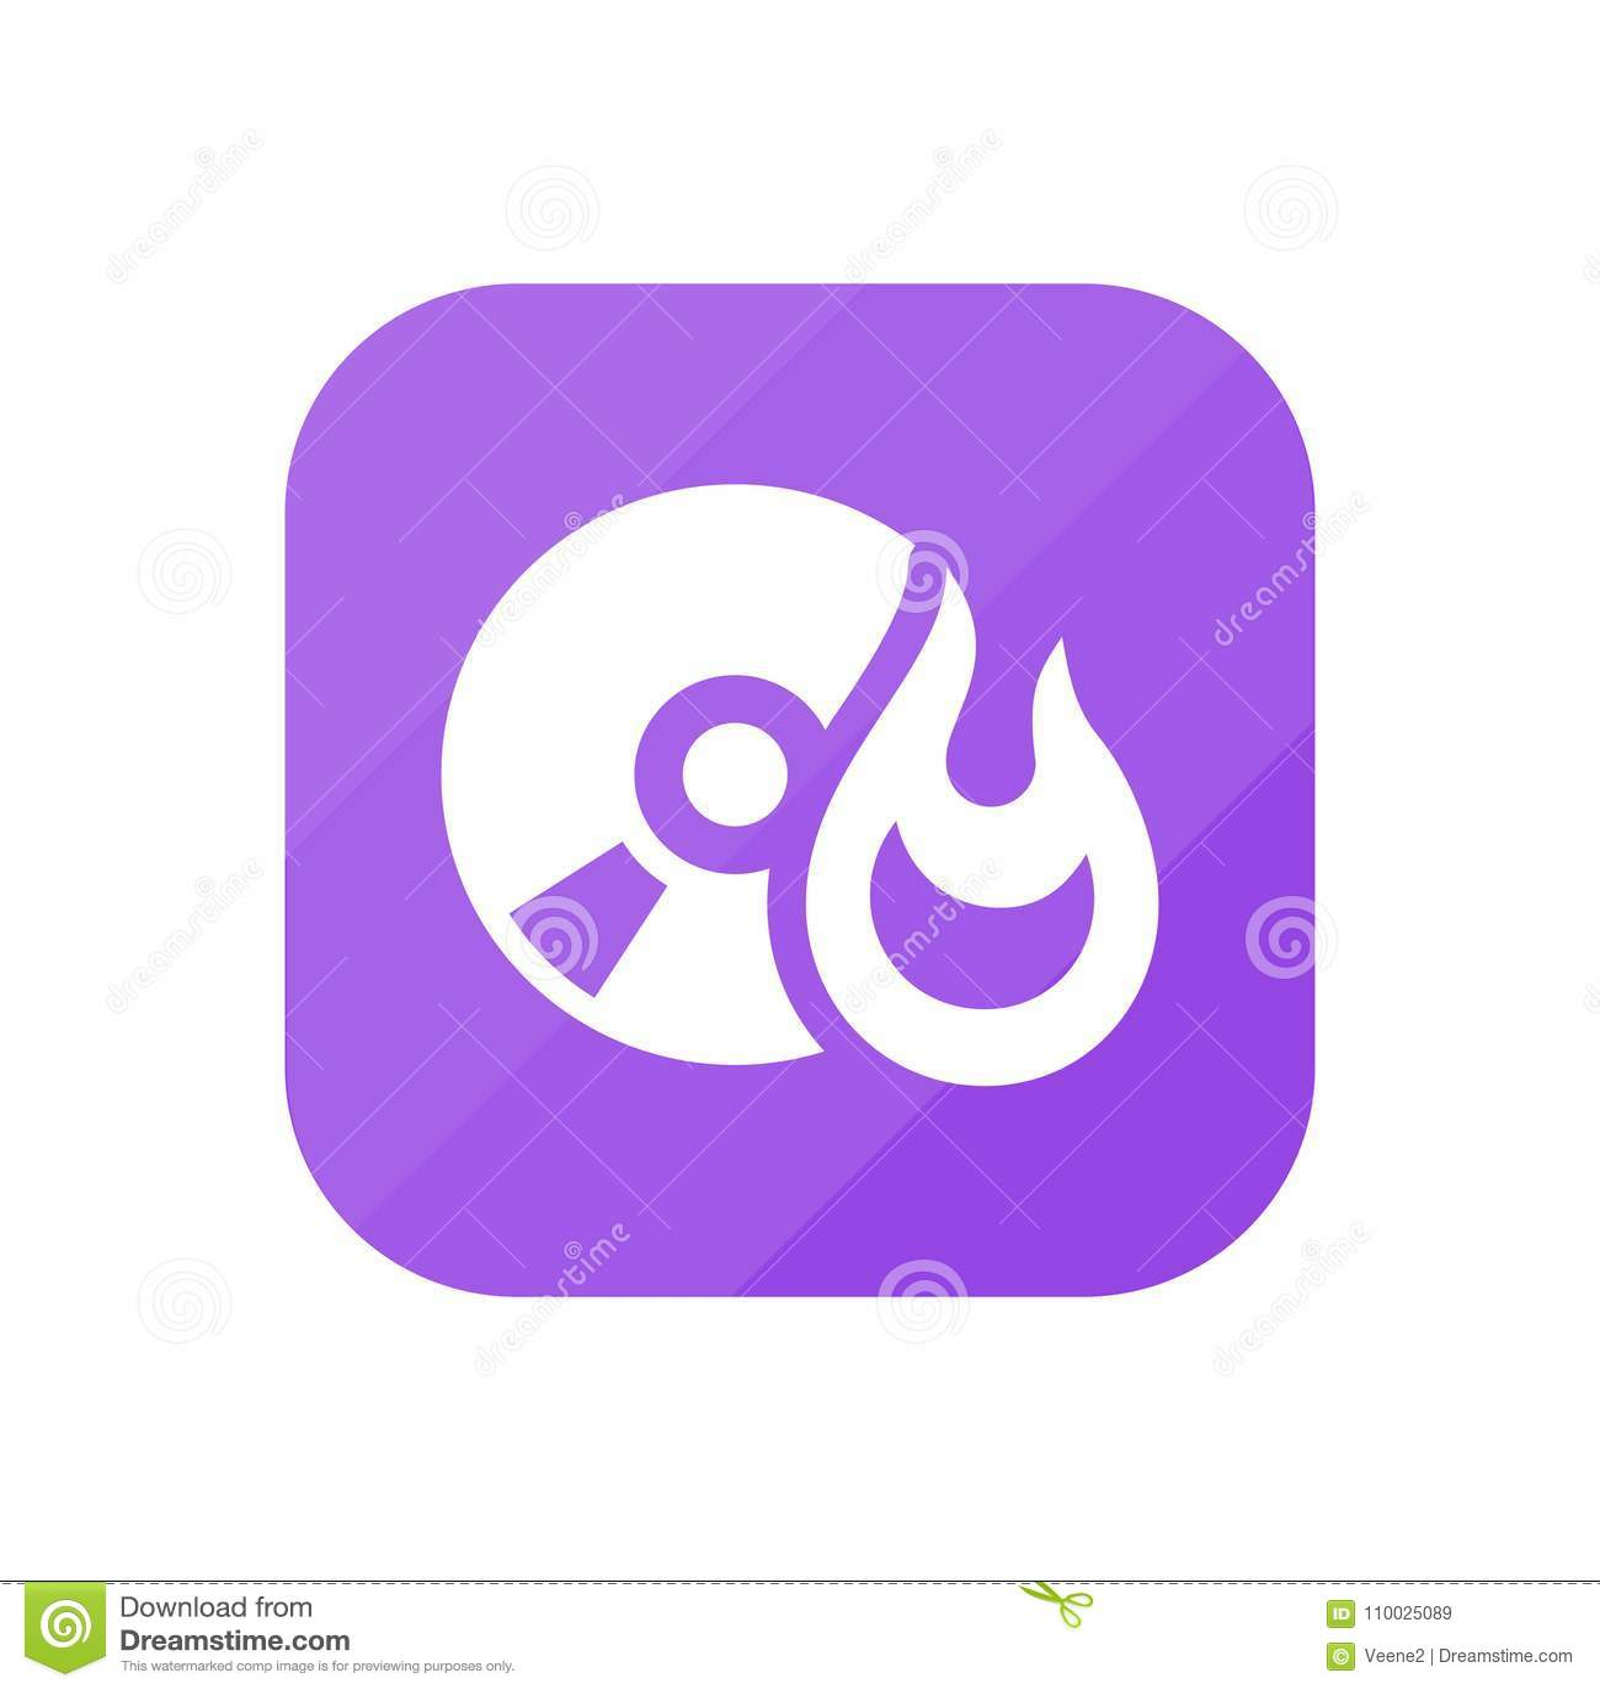 Brandwondcd - App Pictogram